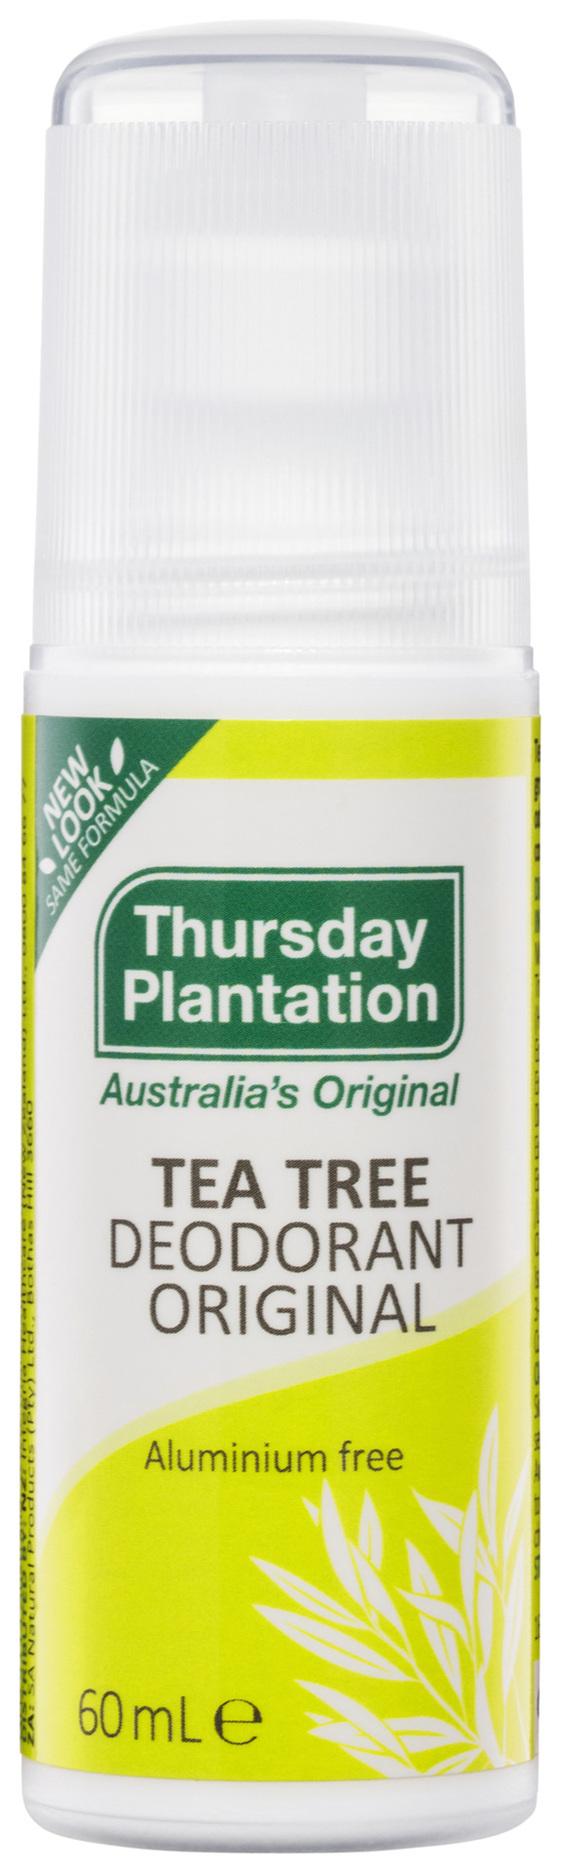 Thursday Plantation Tea Tree Deodorant Original 60mL